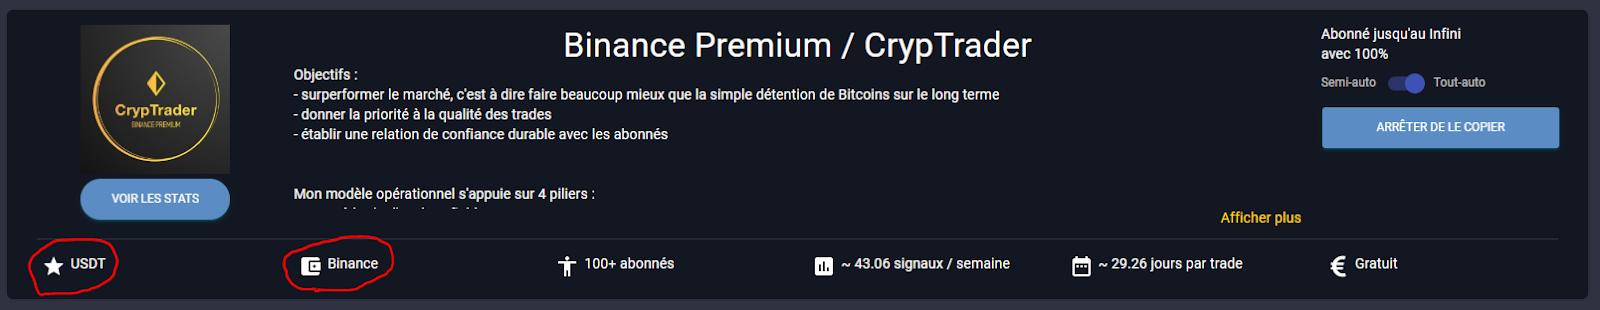 "Choix du Trader ""Binance Premium / CrypTrader"" pour le Copy Trading"